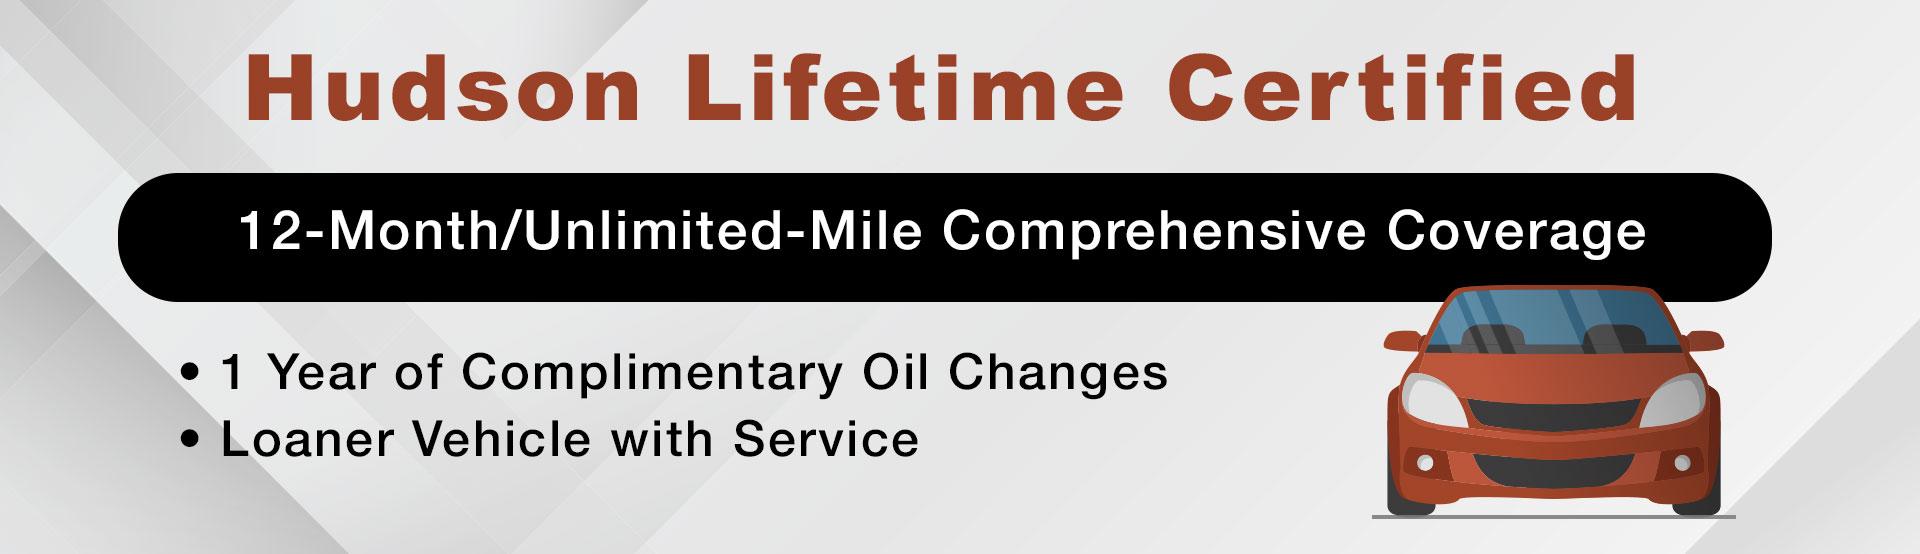 Hudson Lifetime Certified